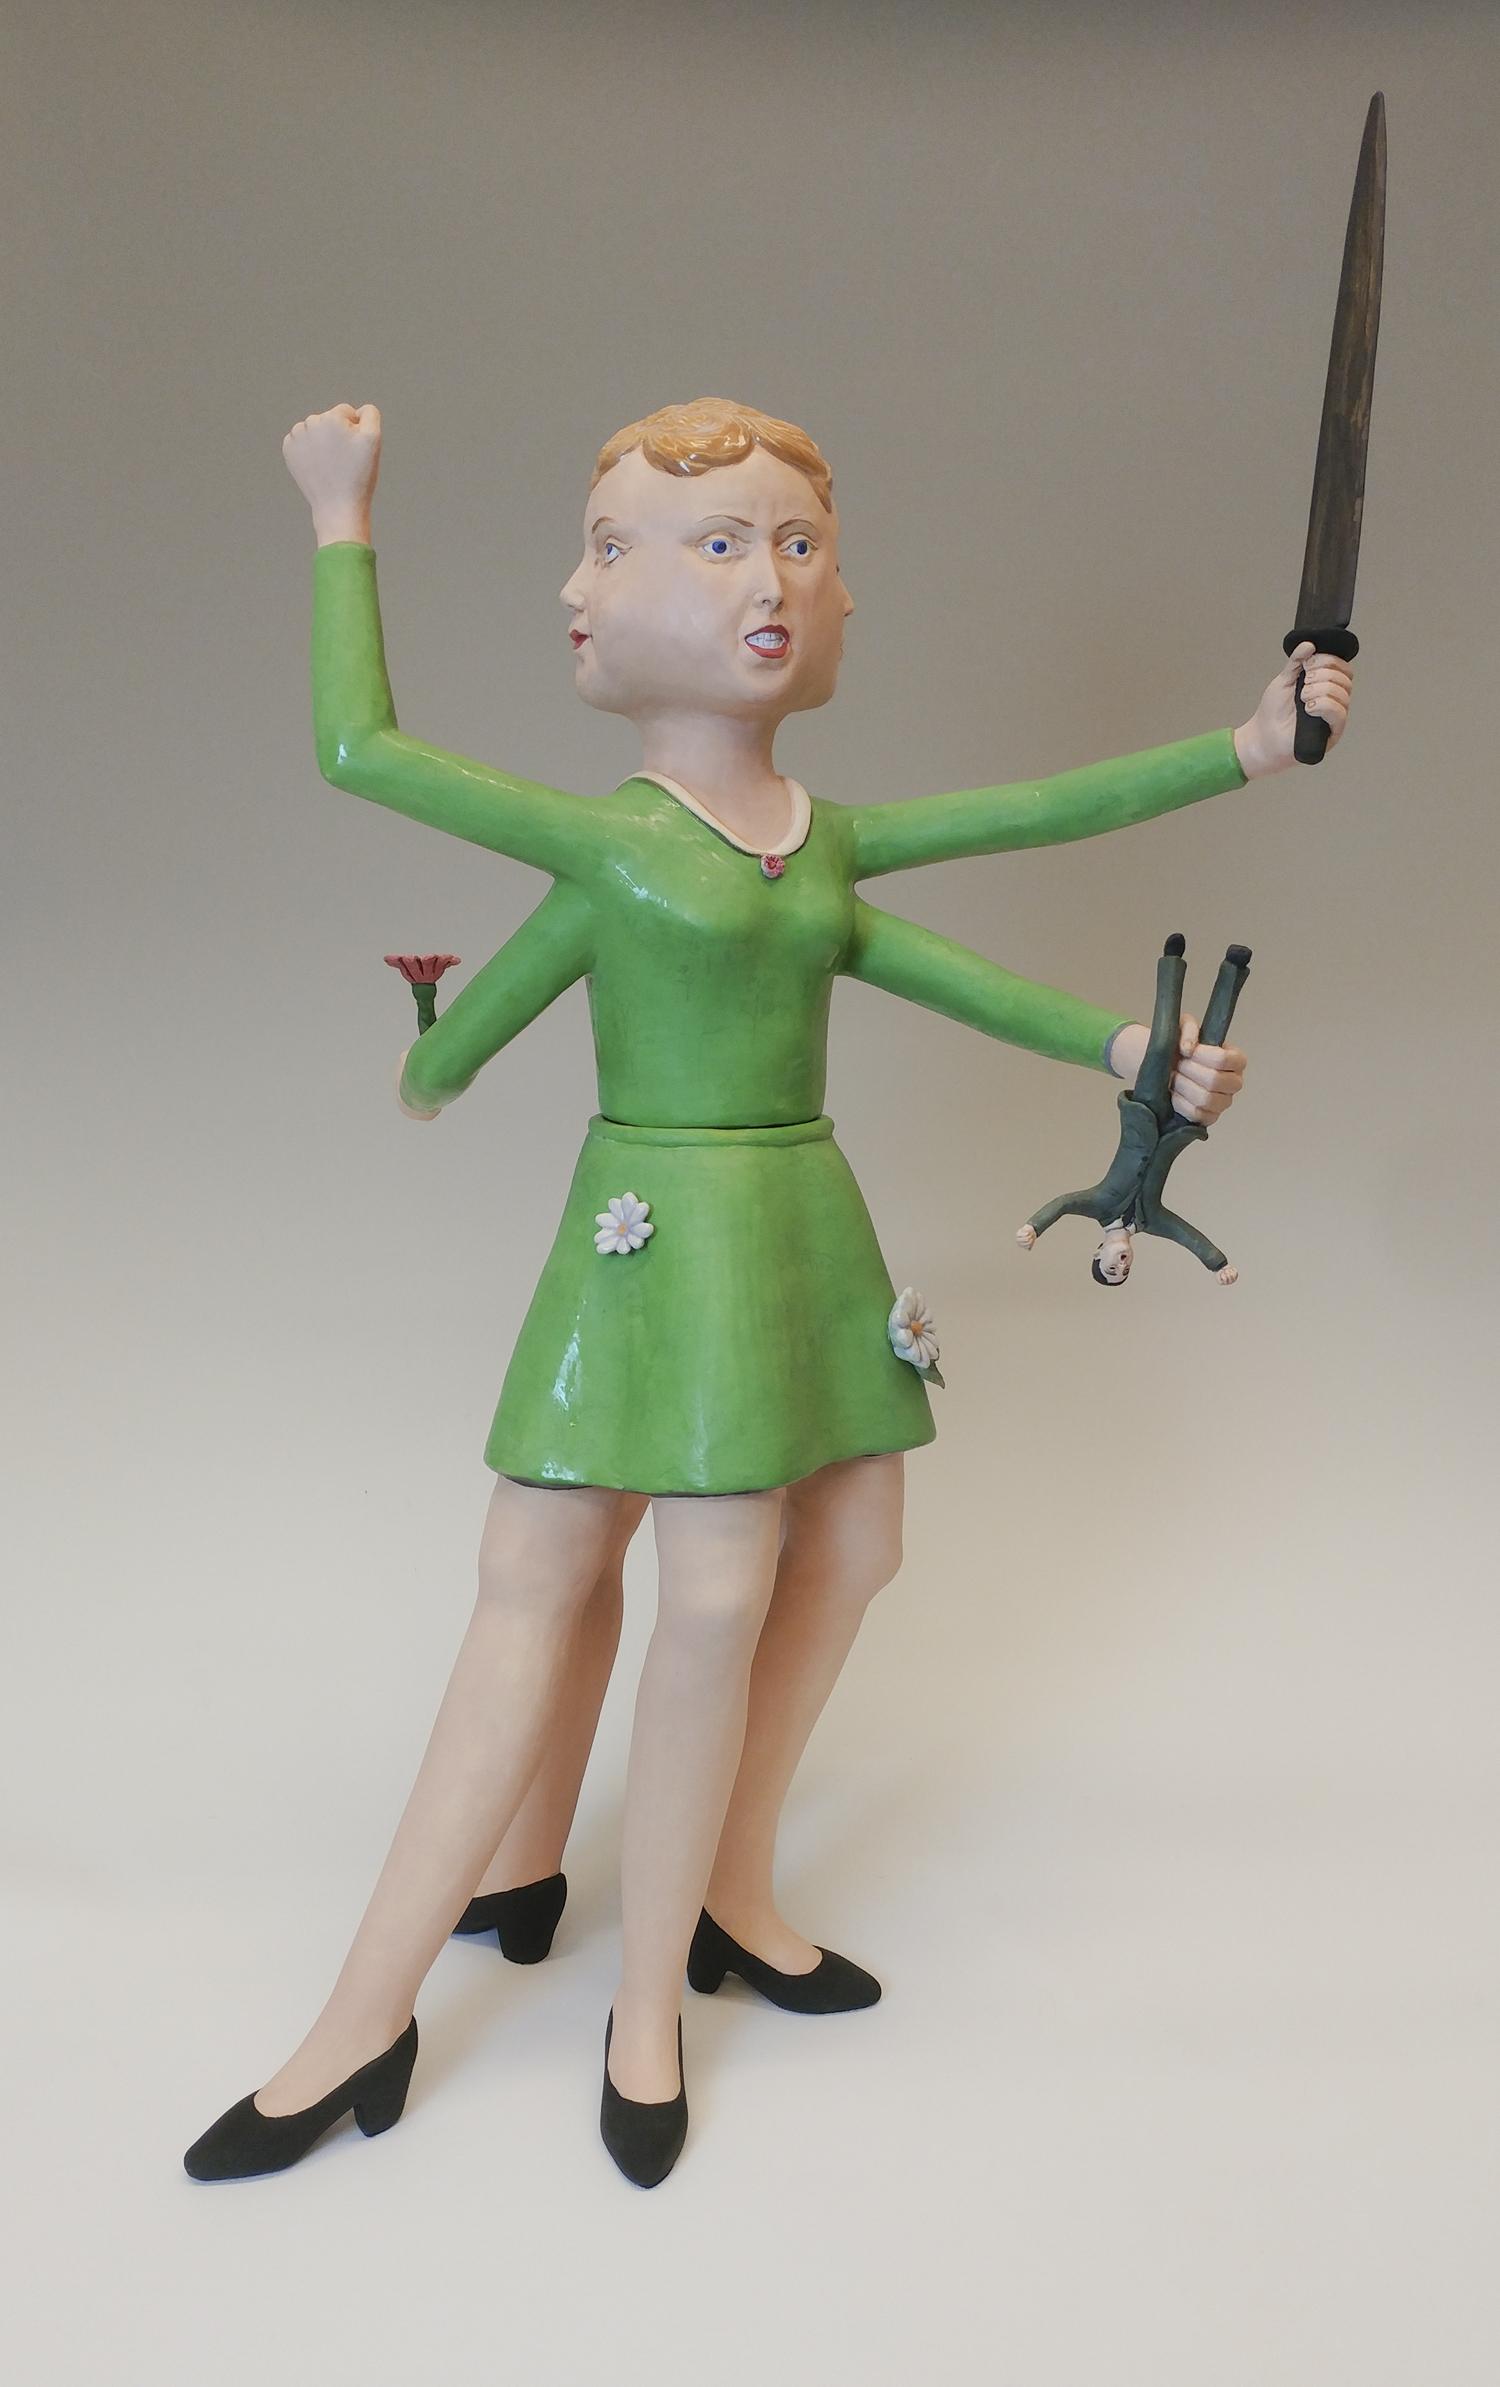 sculpture, political art, ceramics, figure